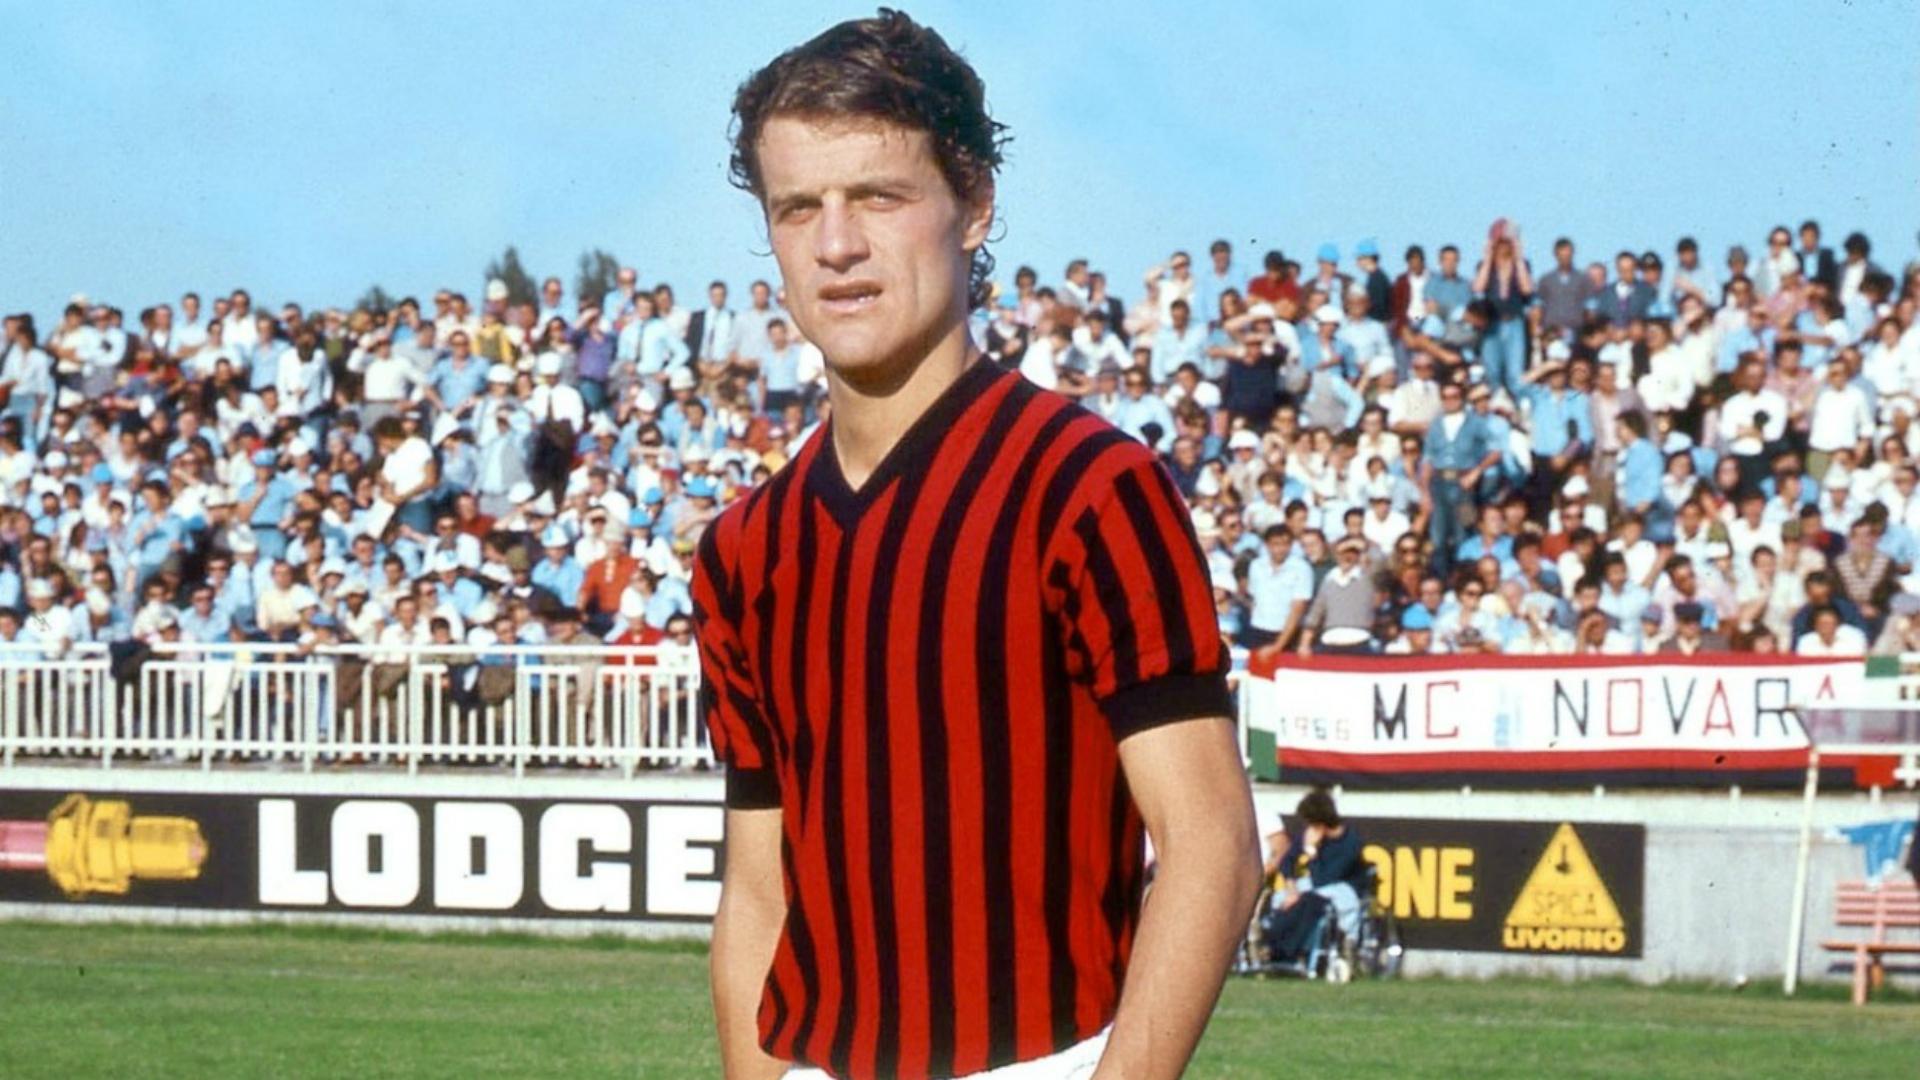 Selain itu ia juga pernah menjuarai Coppa Italia dua kali. Masing-masing  satu kali saat memperkuat AS Roma dan Milan. SIMAK JUGA  Fabio Capello ... 43ca3bad51aa